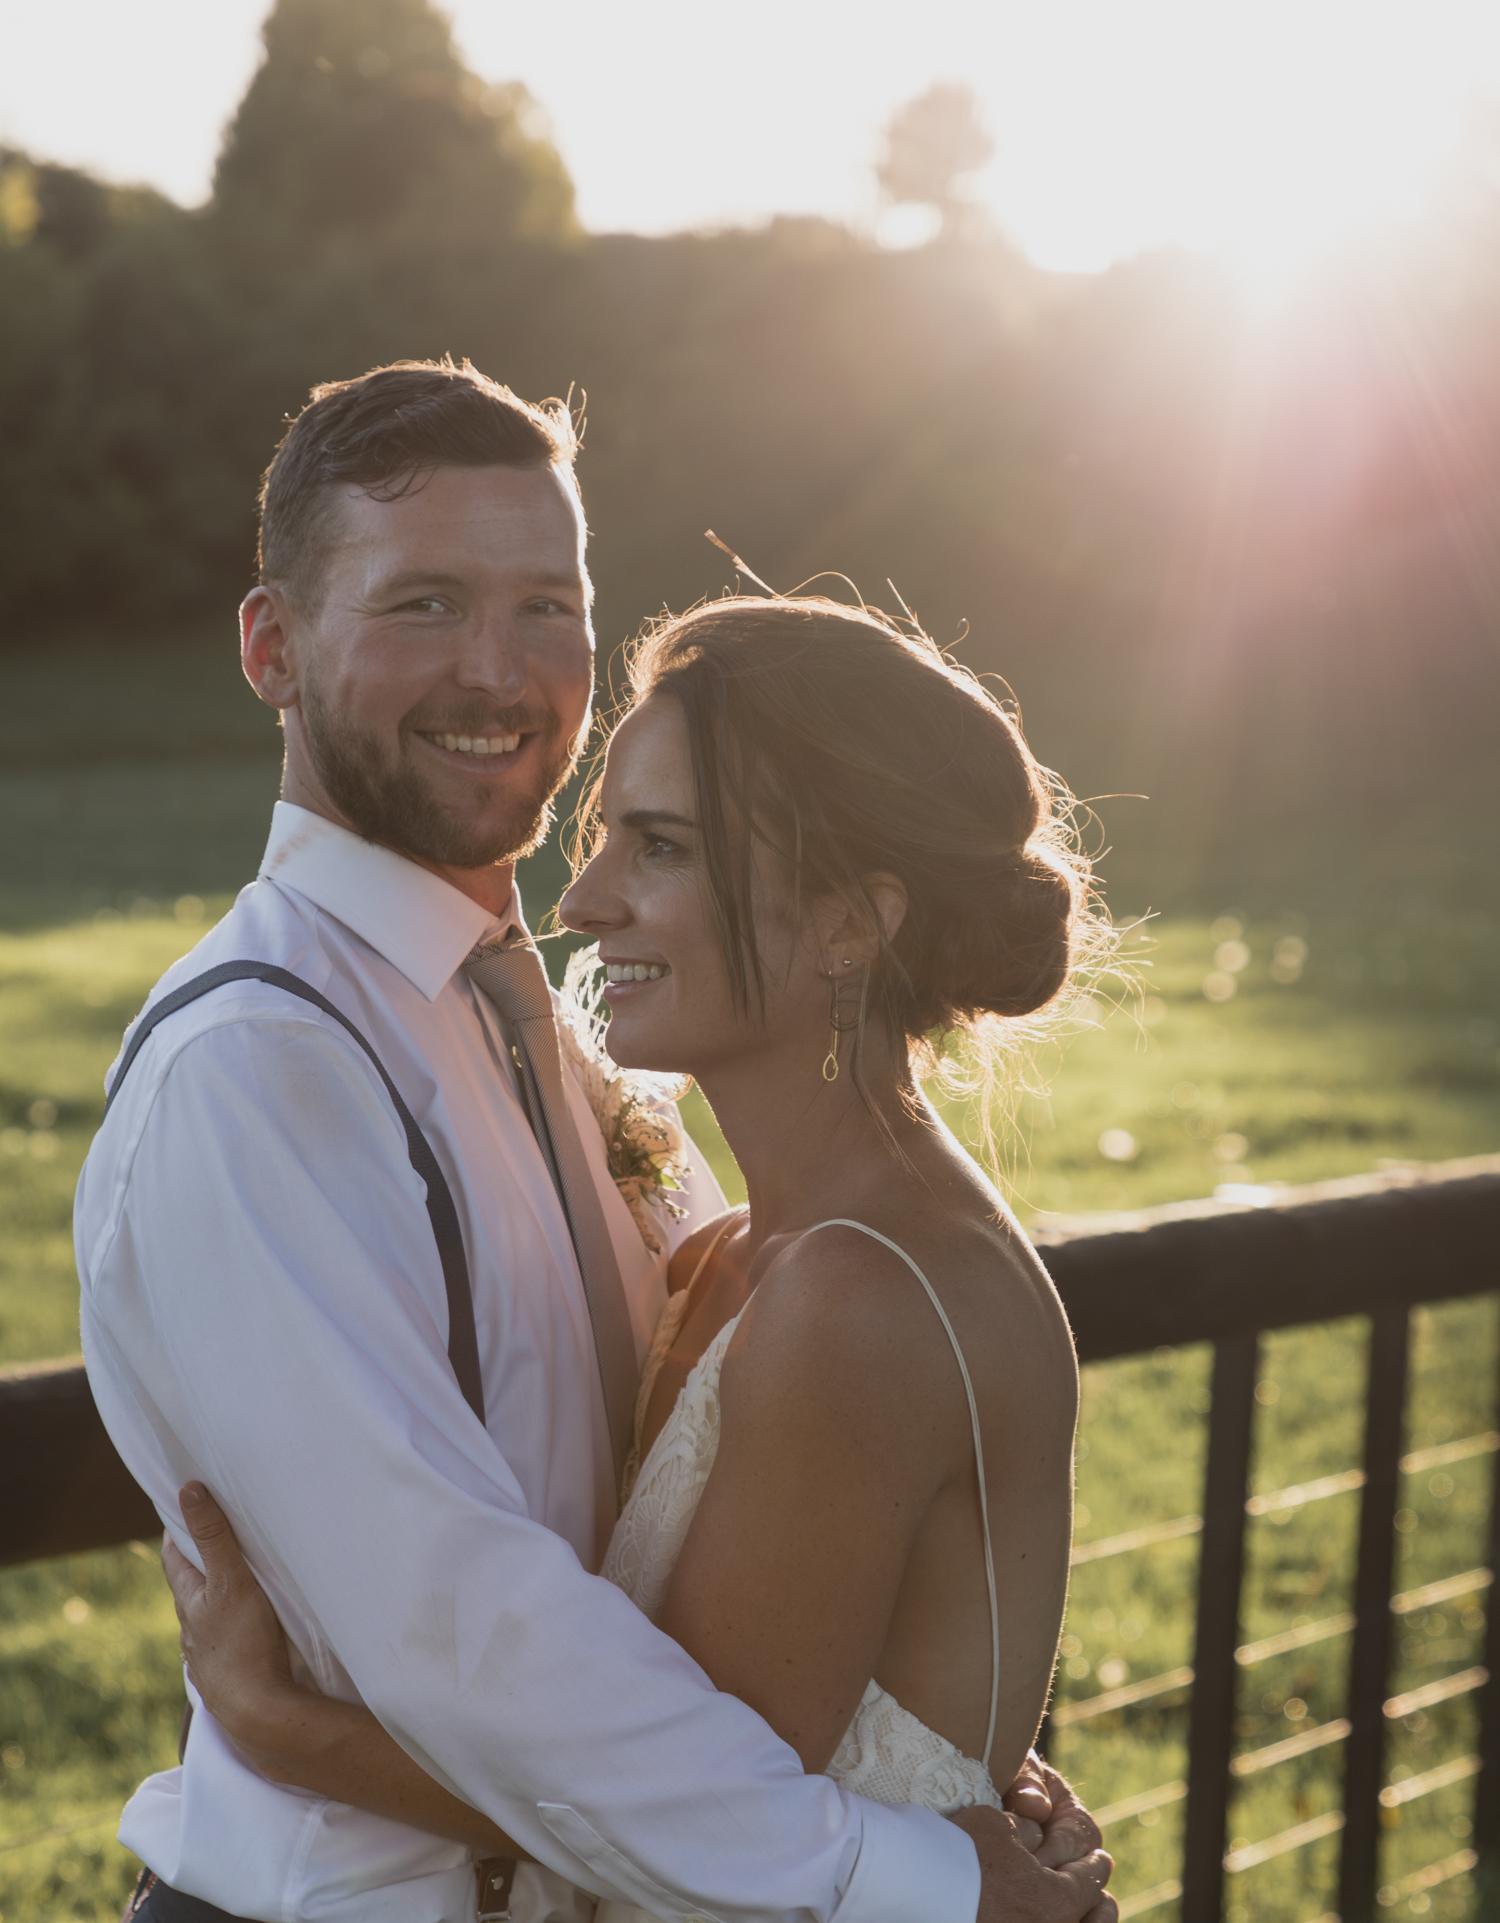 wedding-at-the-red-barn-new-zealand-wedding-photographer-sunset-bride-and-groom.jpg